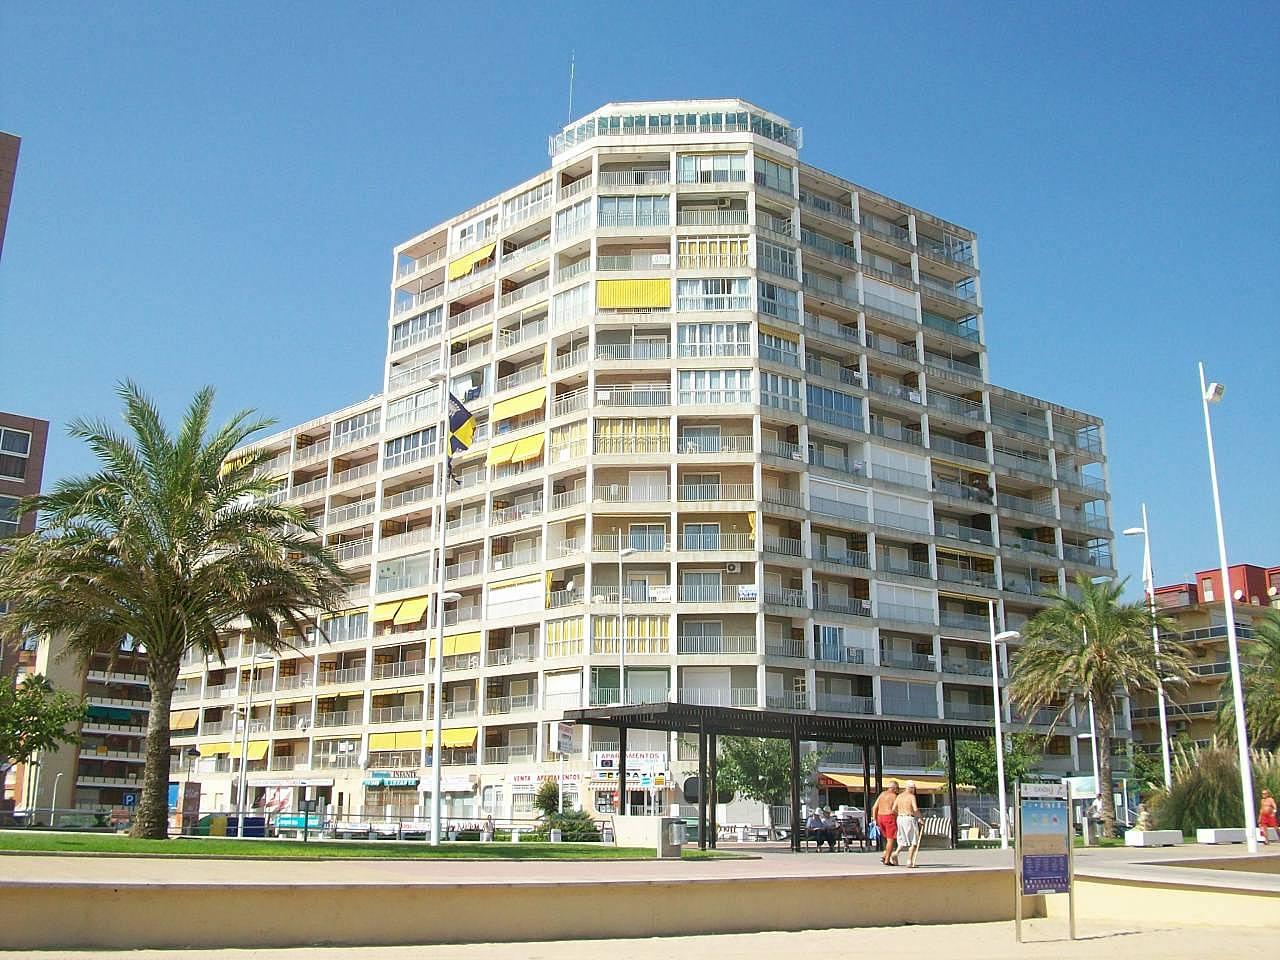 Gandia apartamentos 1 l nea de la playa gandia valencia - Playa gandia apartamentos ...